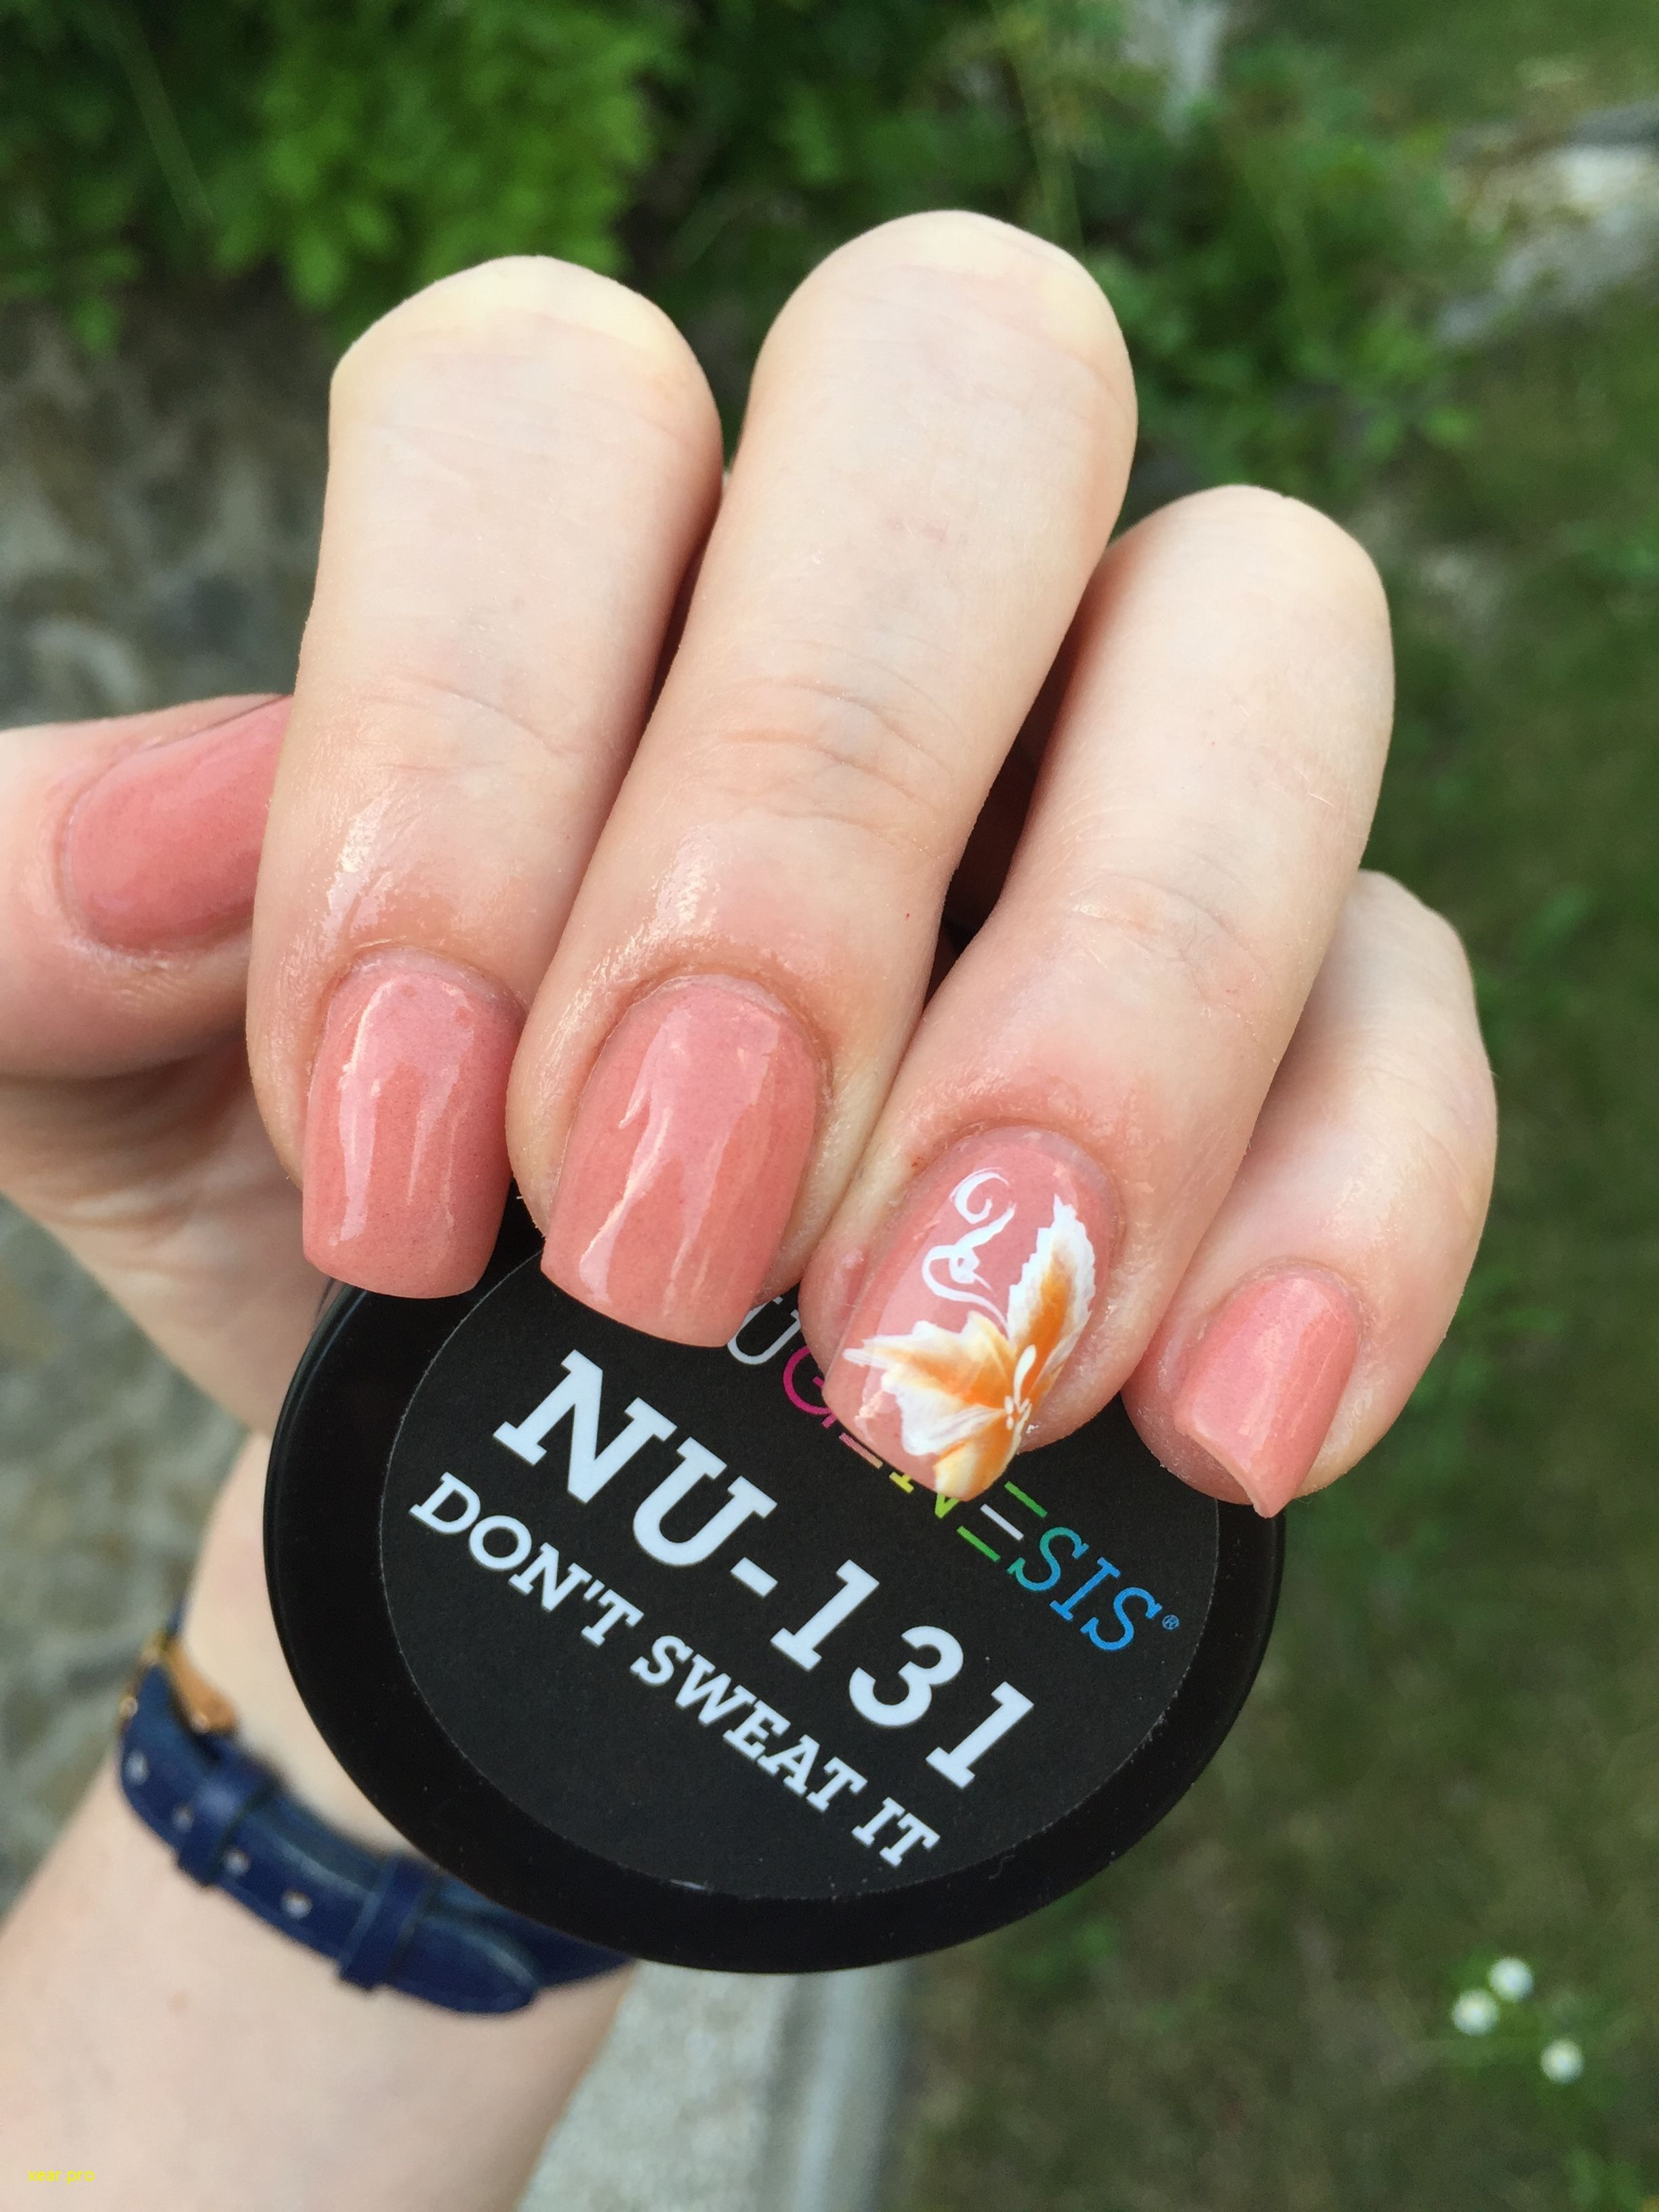 Best of how to make acrylic nail powder at home dip